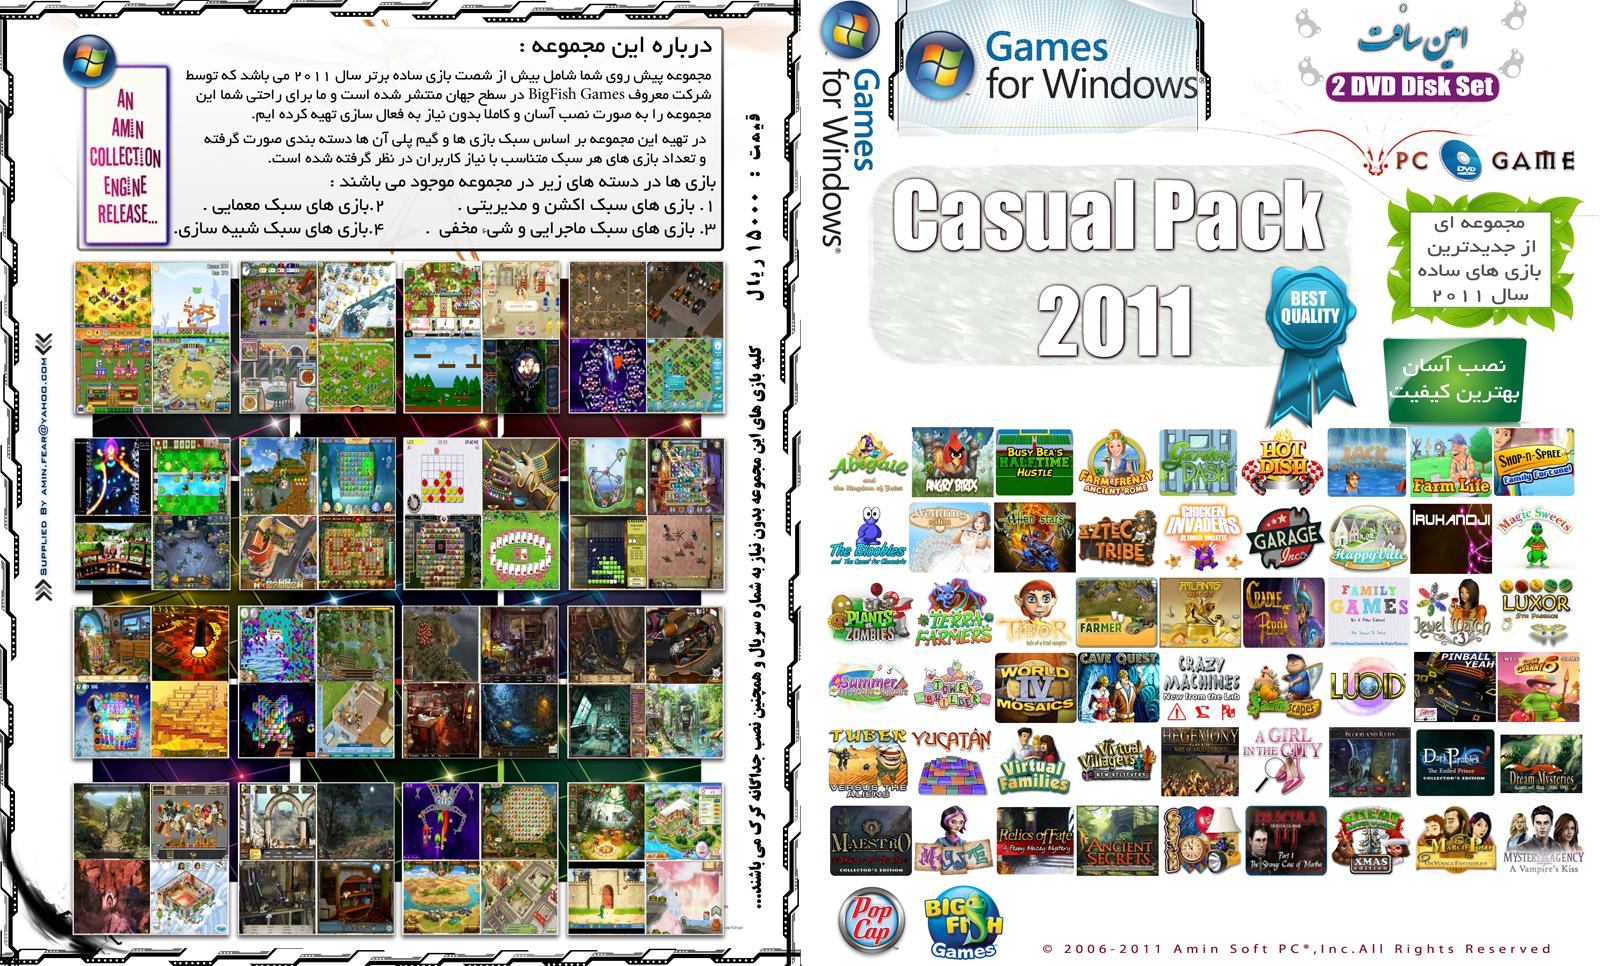 reflexive games список с картинками